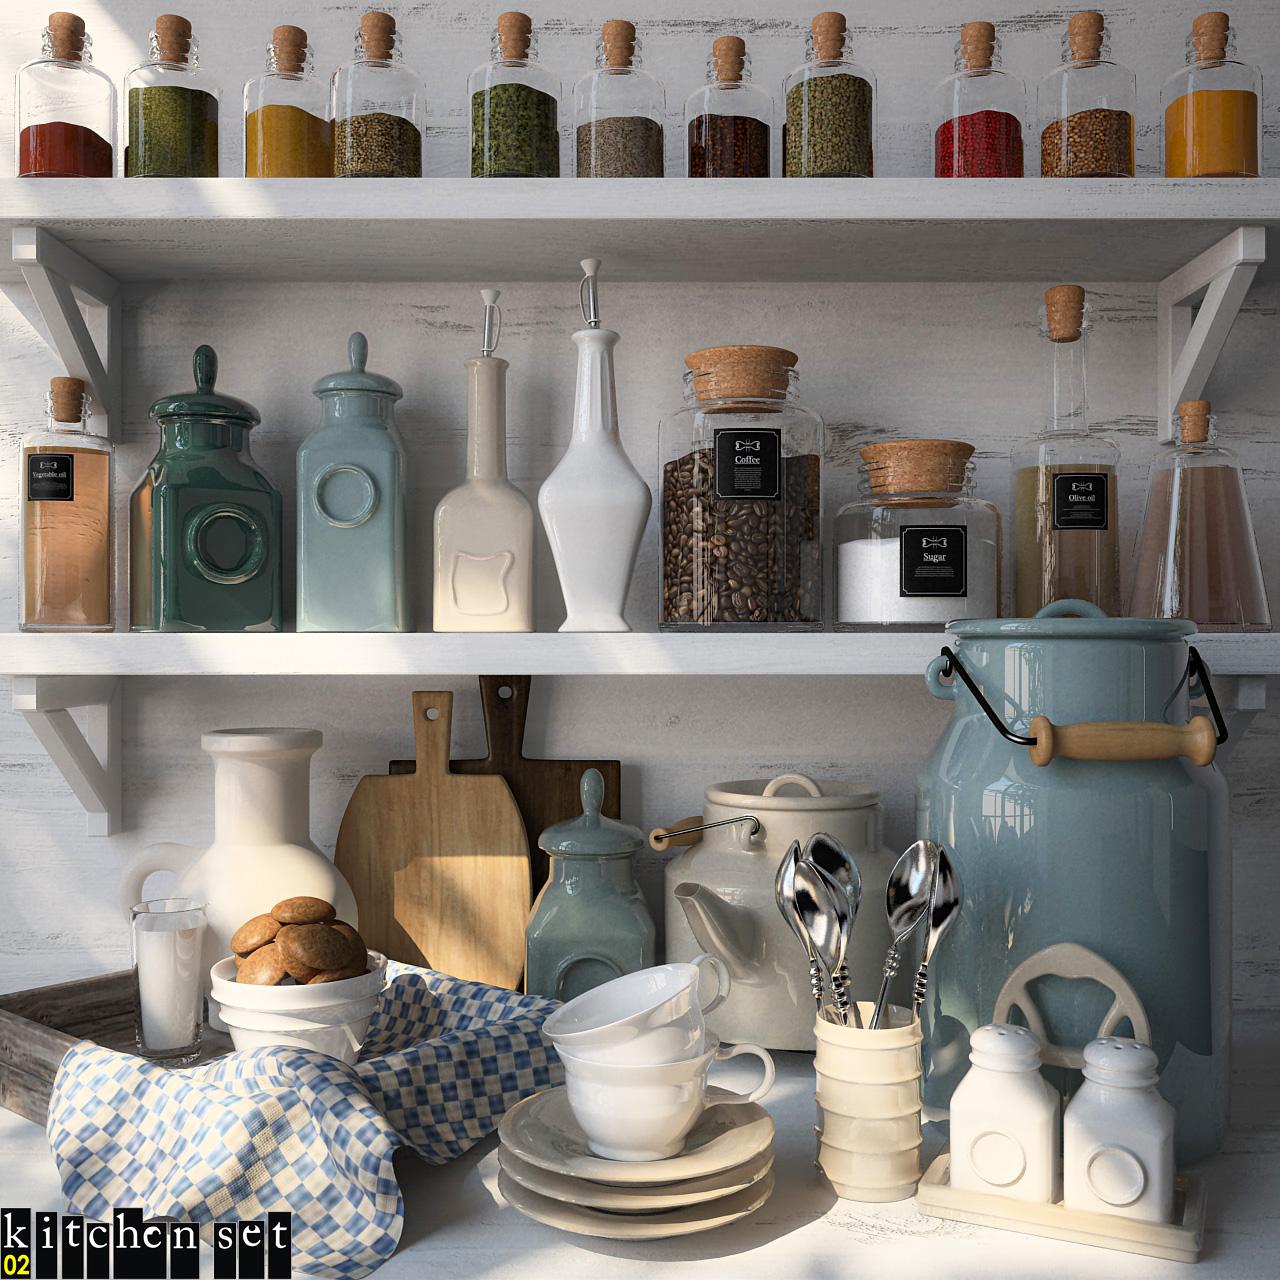 1  Kitchen Sets Collection Free Sketchup Models